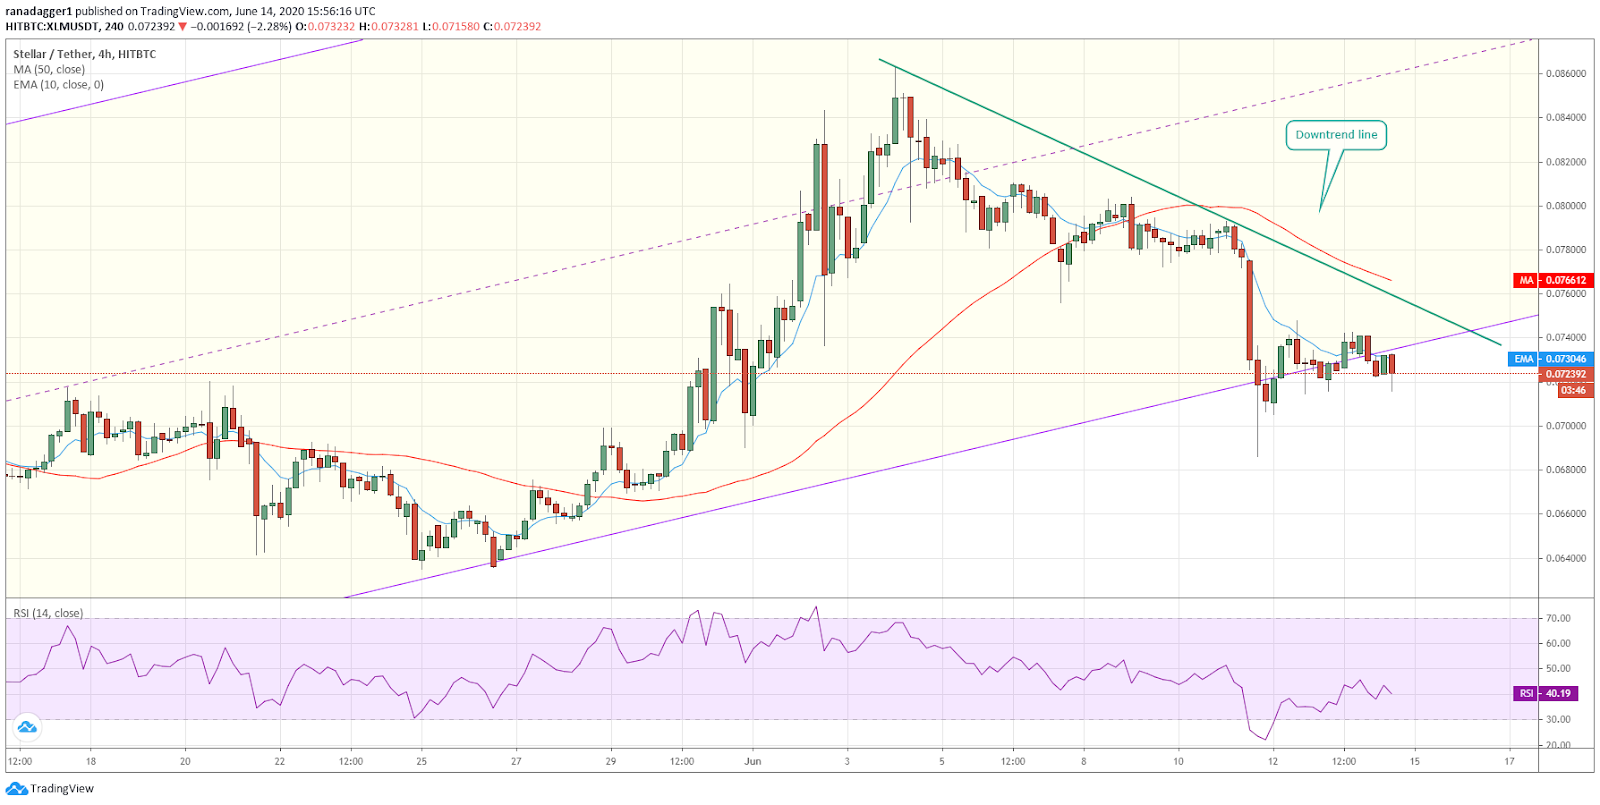 XLM/USD 4-hour chart. Source: Tradingview